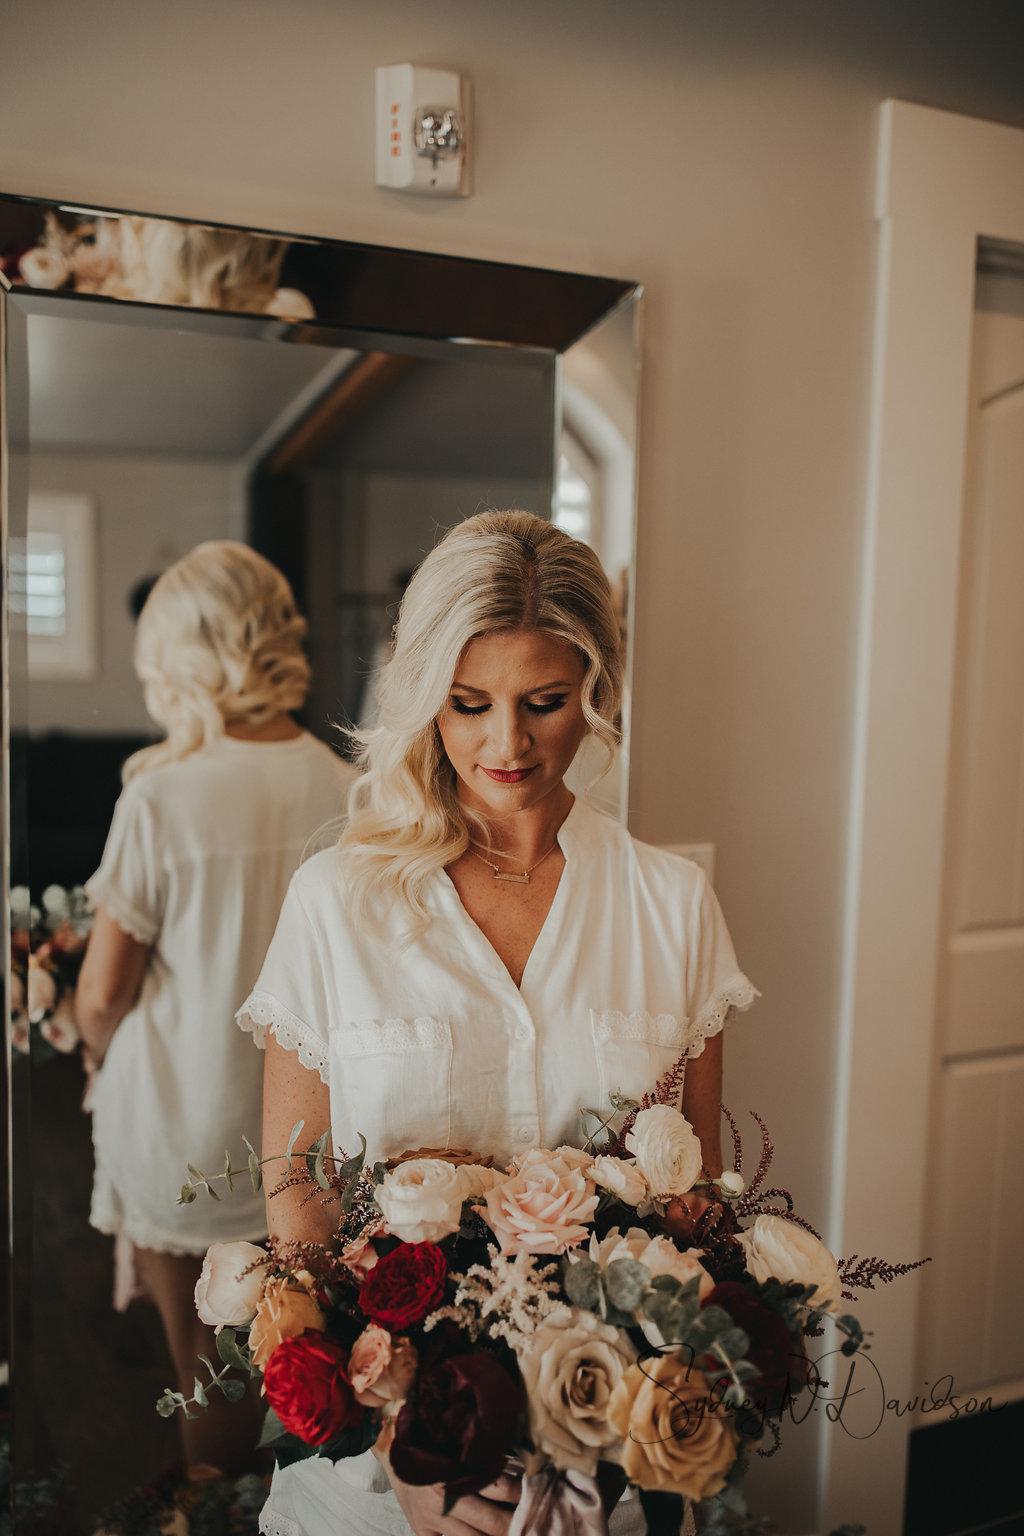 sydney-davidson-wedding-stillwater-oklahoma-wedding-session-traveling-photographer-portrait-tulsa-oklahoma-1394.jpg